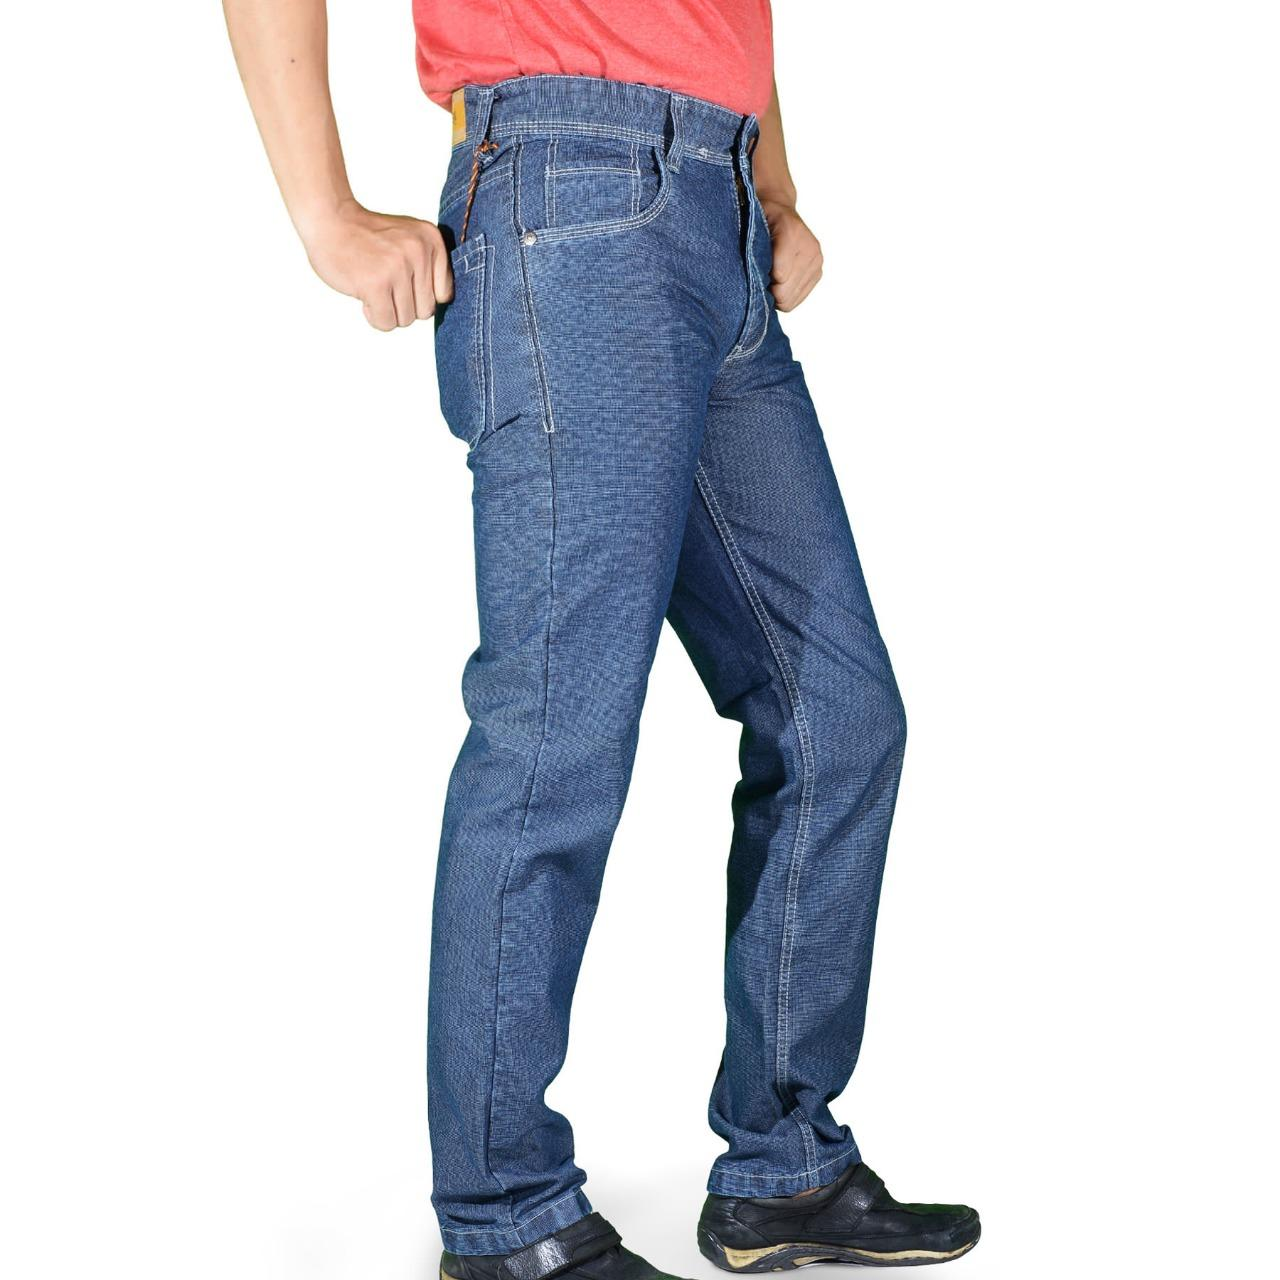 Emba Casual Celana Panjang Pria EPA 012 Modern Basic 116-12904-29 - Heavy Stone Basic